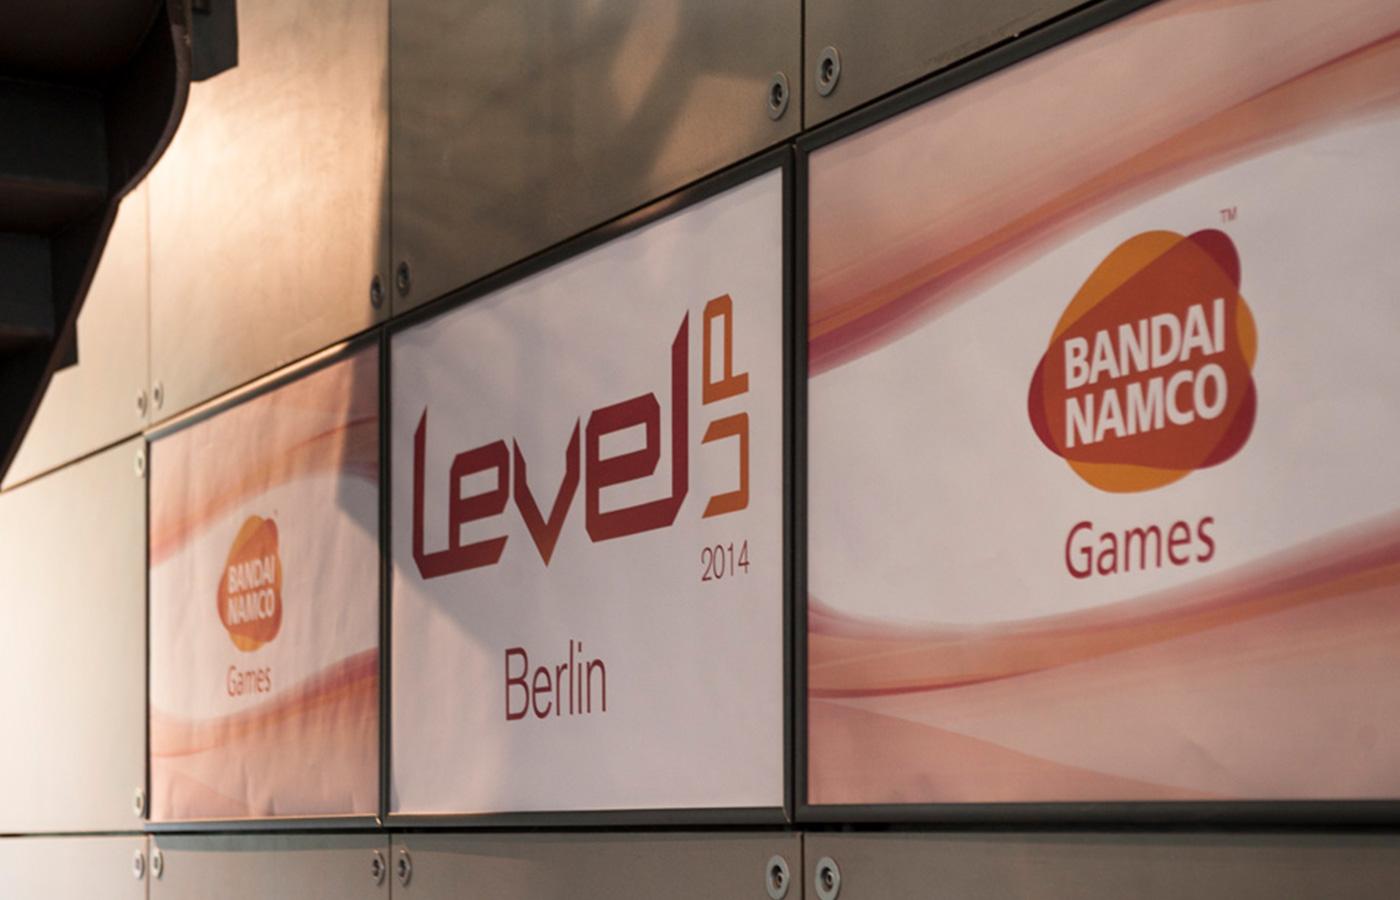 Bandai Namco – Levelup